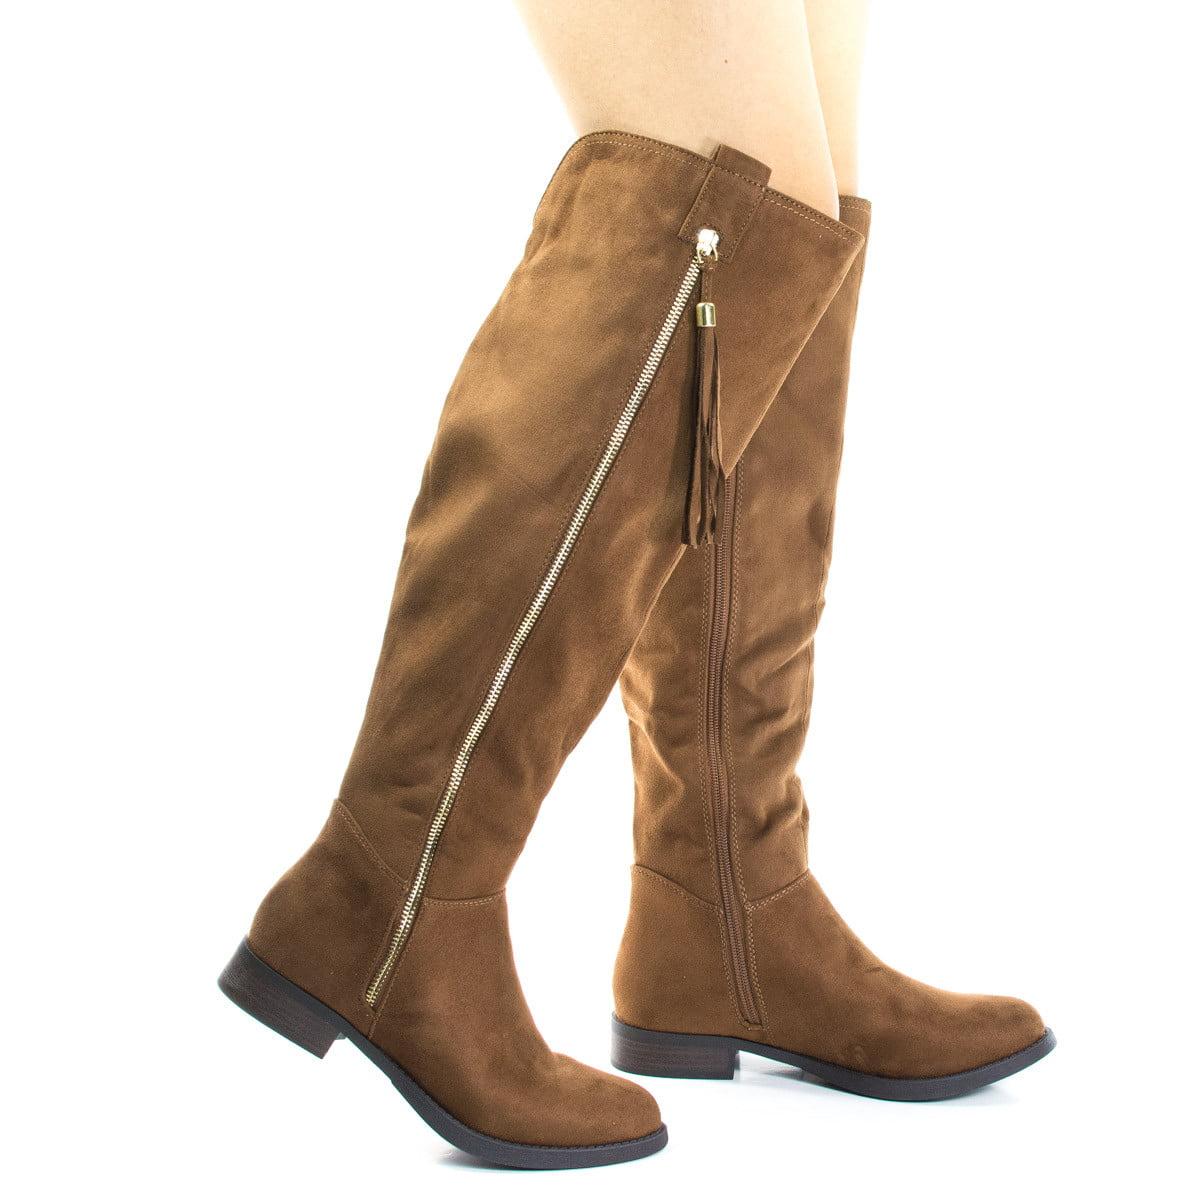 Abela by Soda, Equestrian Riding Boots W Stack Heel & Tassel On Zipper